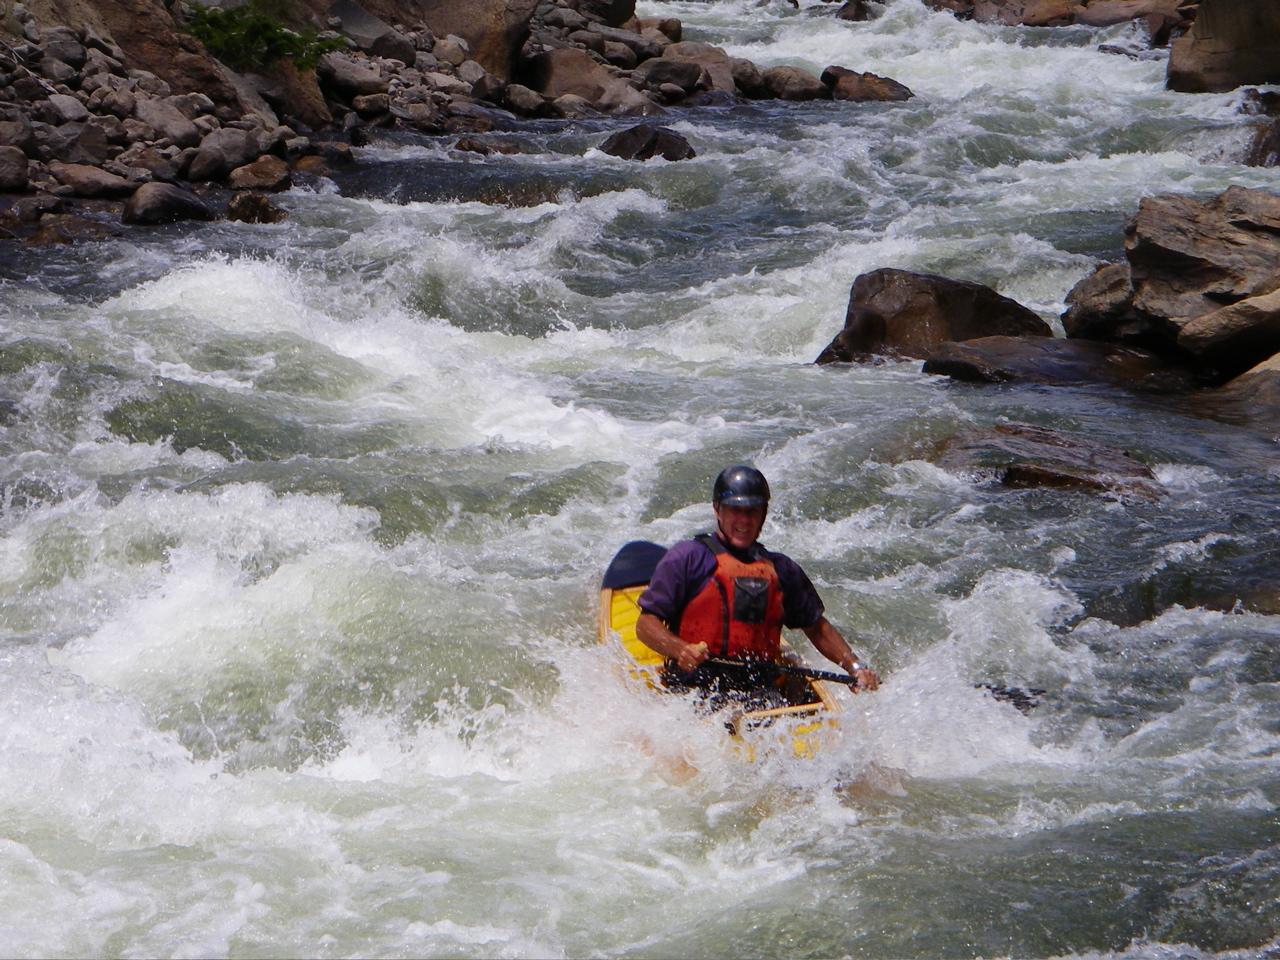 Click image for larger version  Name:John below Pine Creek.jpg Views:157 Size:682.4 KB ID:297